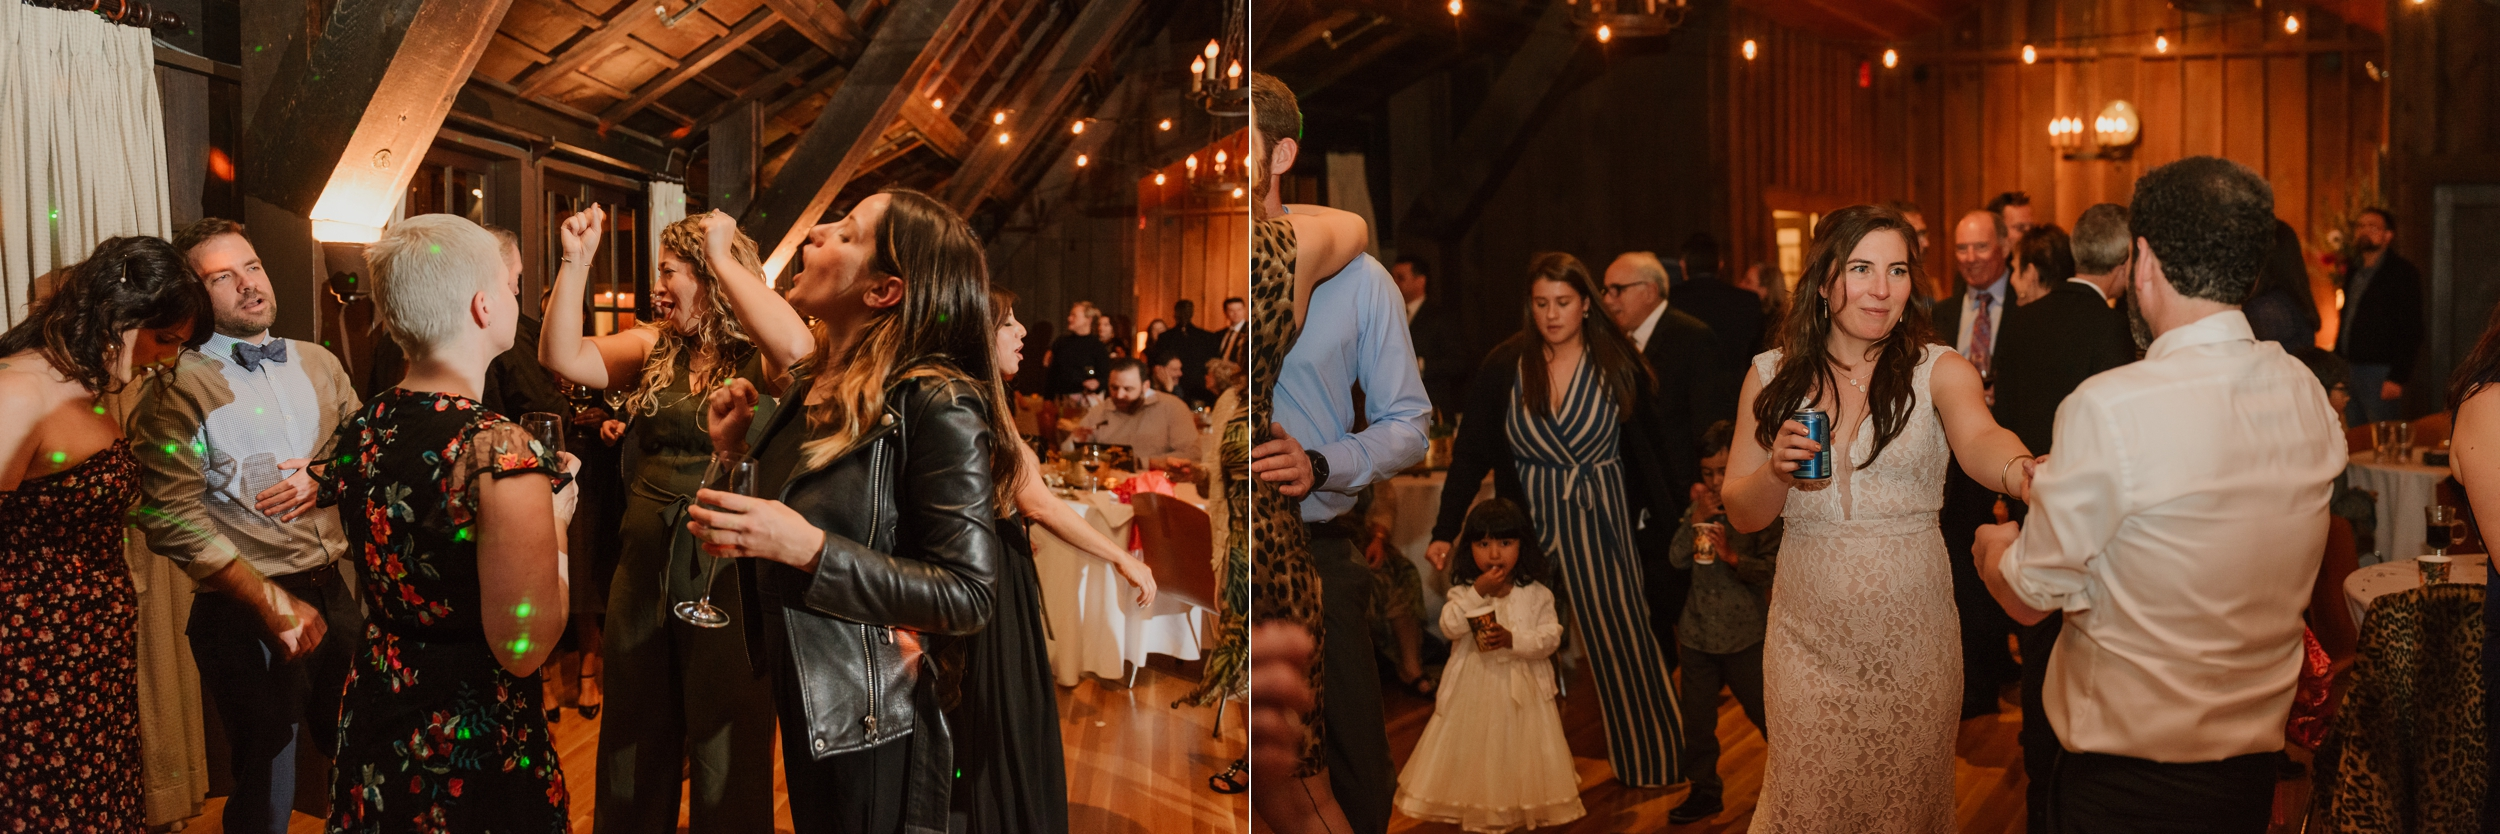 086winter-mill-valley-wedding-outdoor-art-club-wedding-vivianchen-477_WEB.jpg